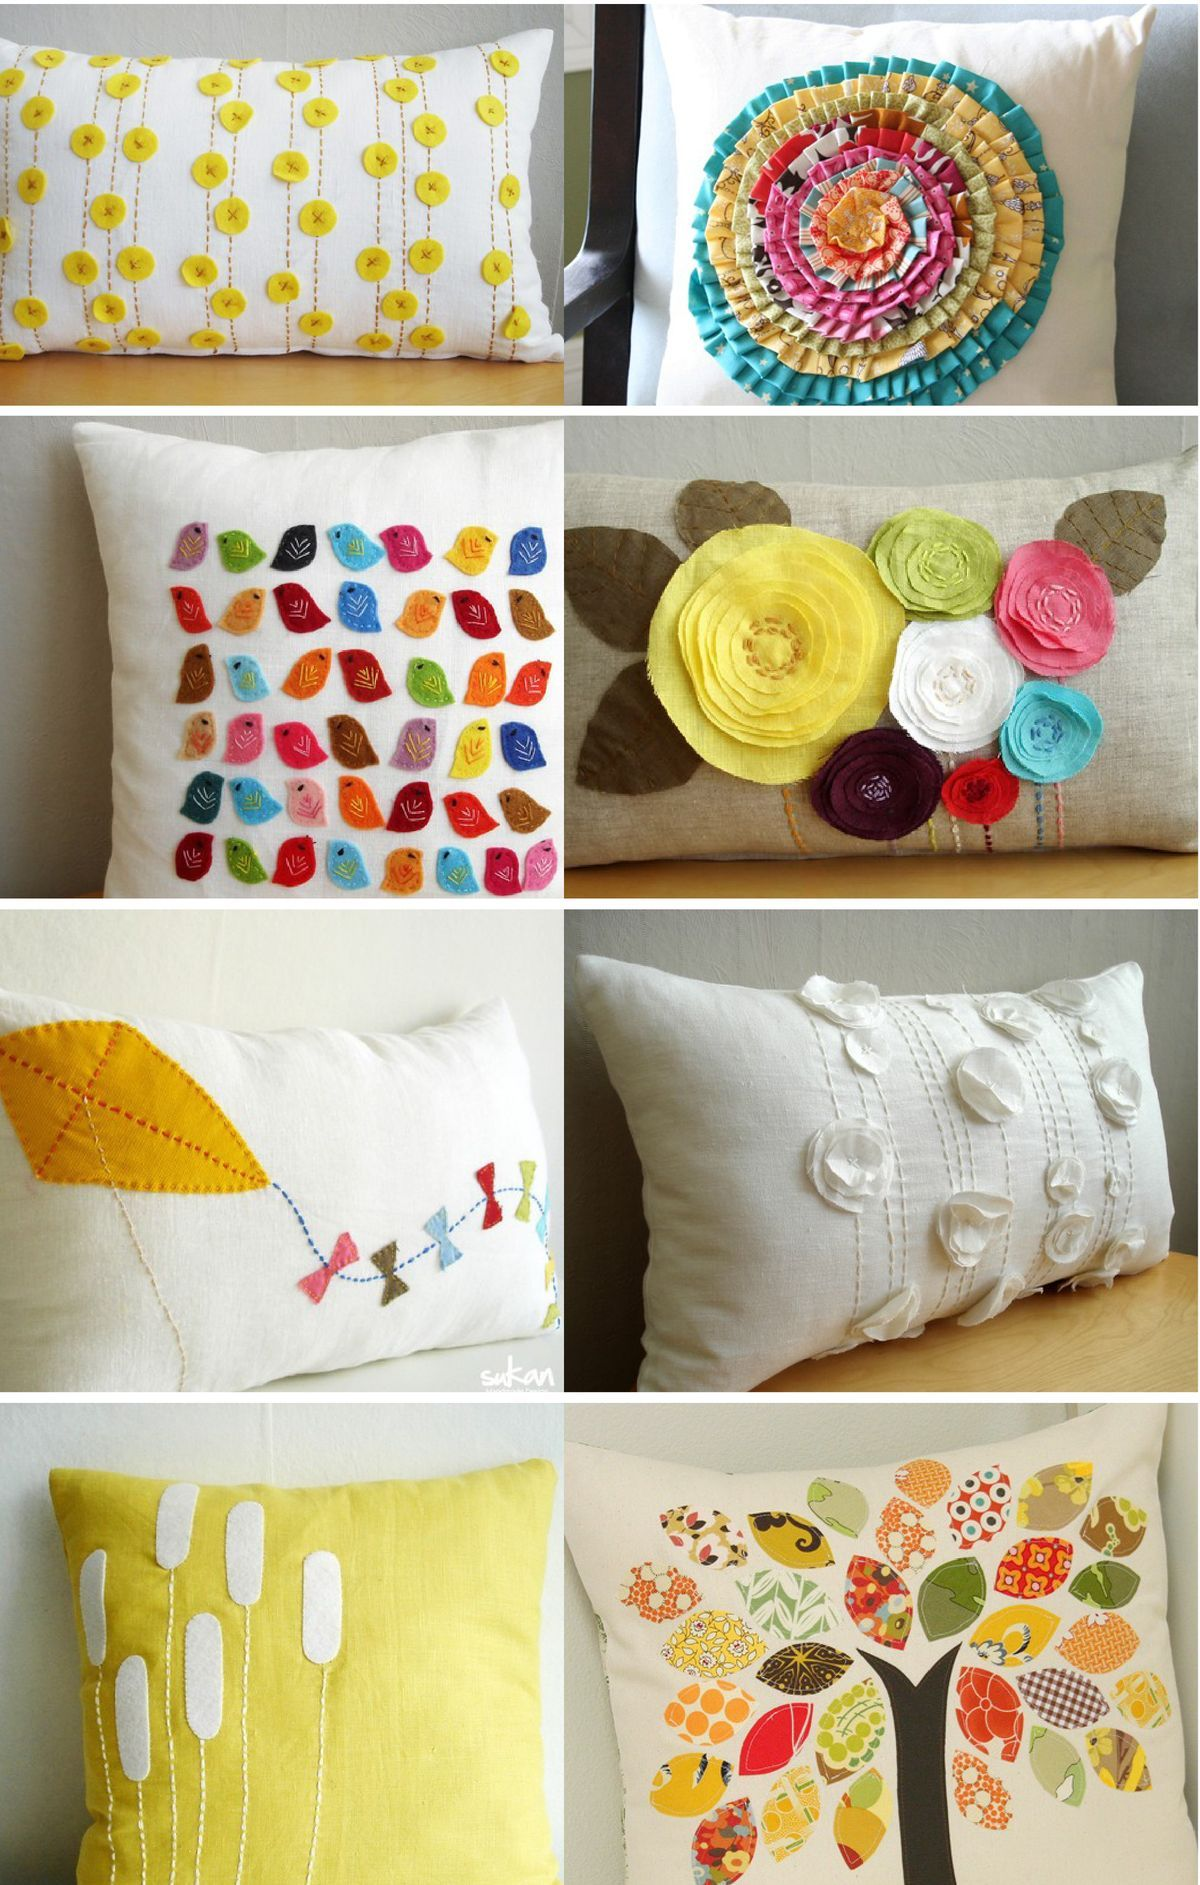 Diy Pillows 이미지 포함 퀼트패턴 공